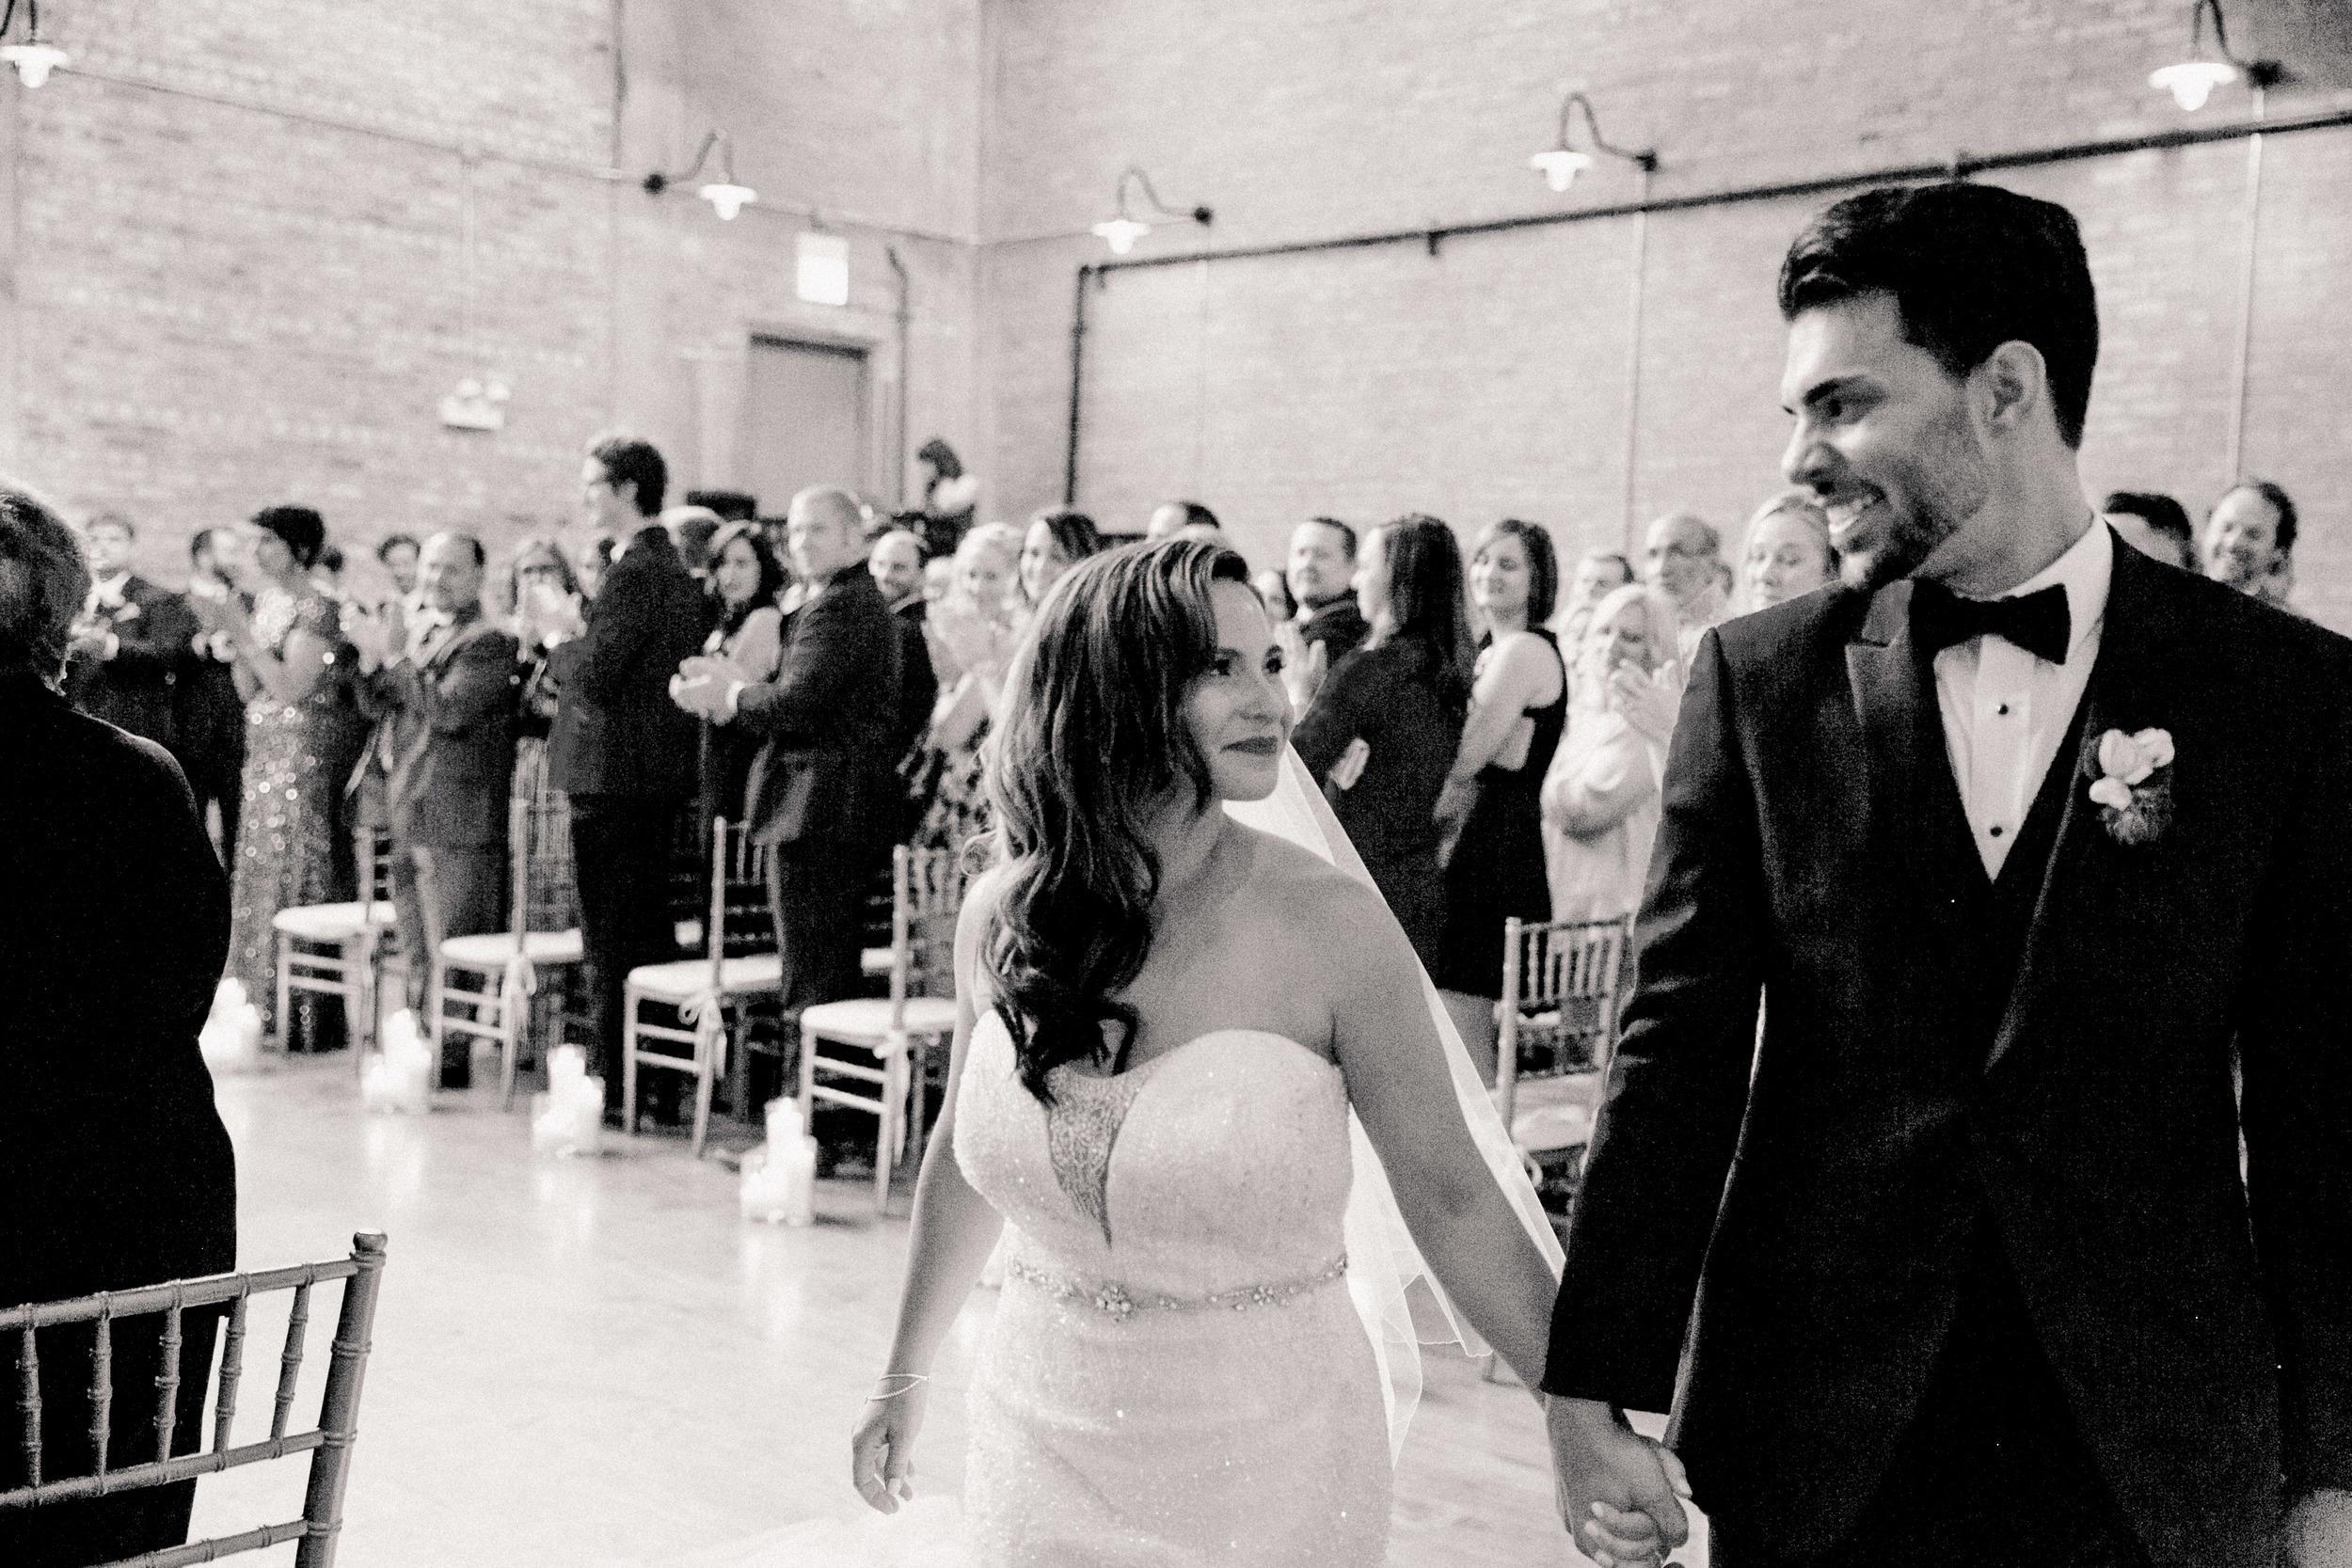 mayden_photography_weddings-118.jpg